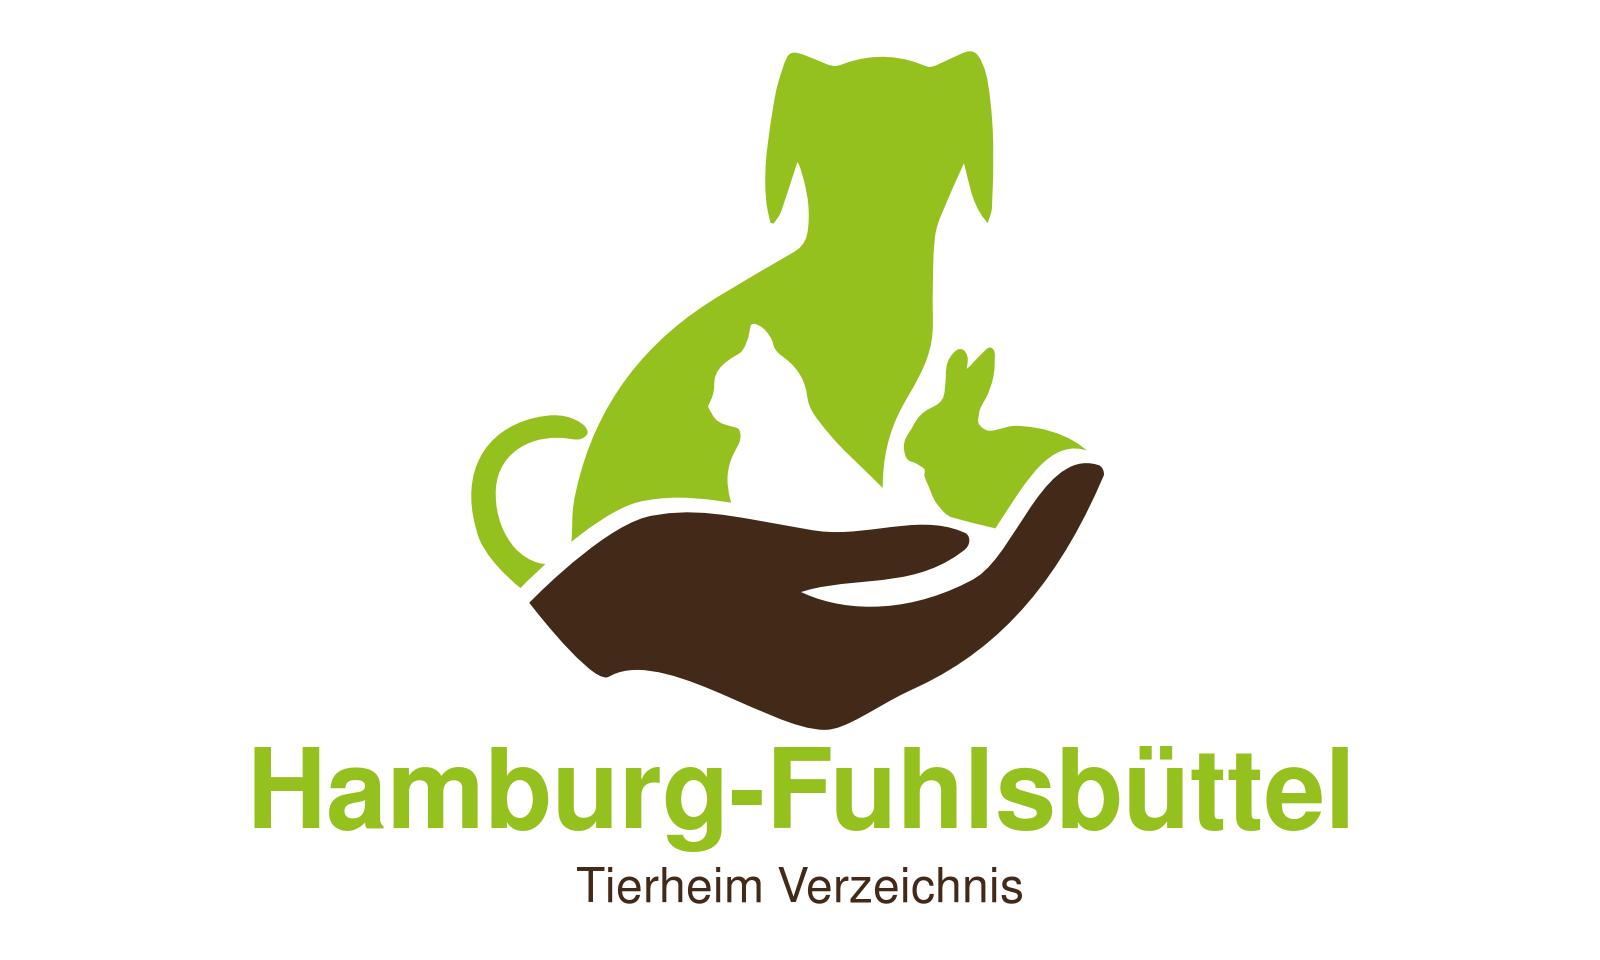 Tierheim Hamburg Fuhlsbüttel